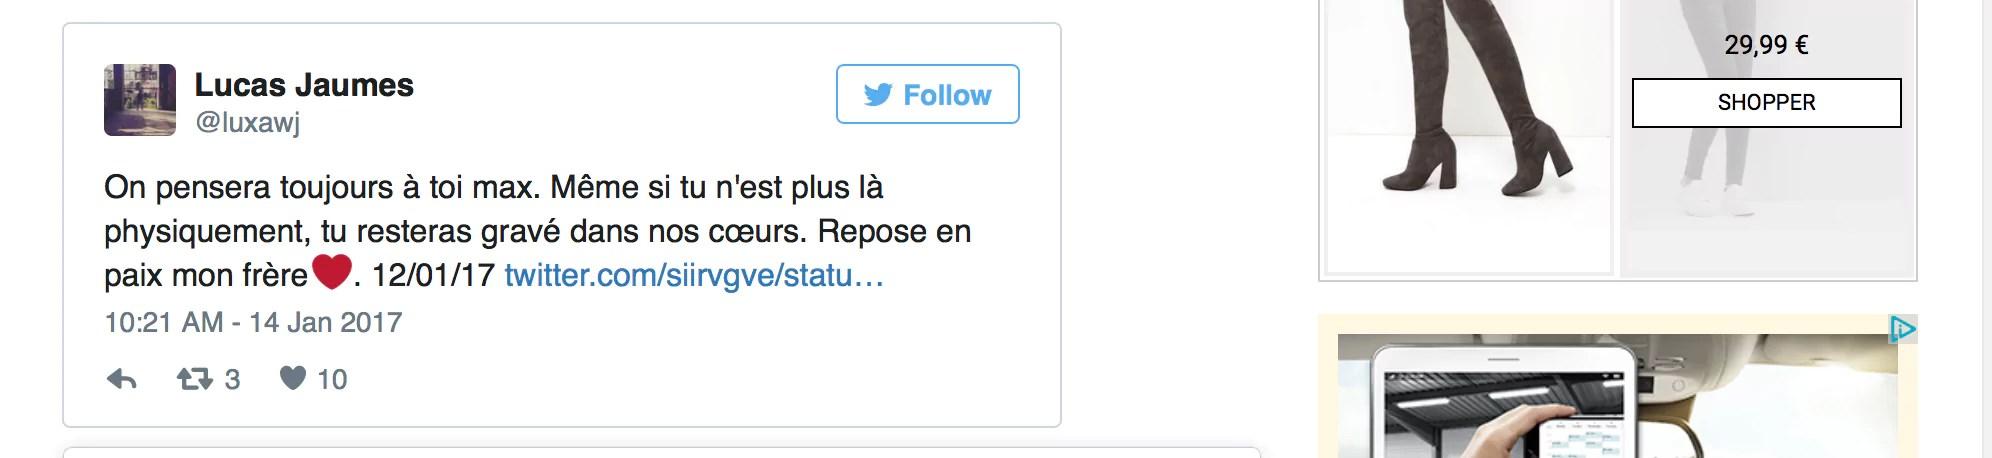 Tweet d'hommage à Maxime